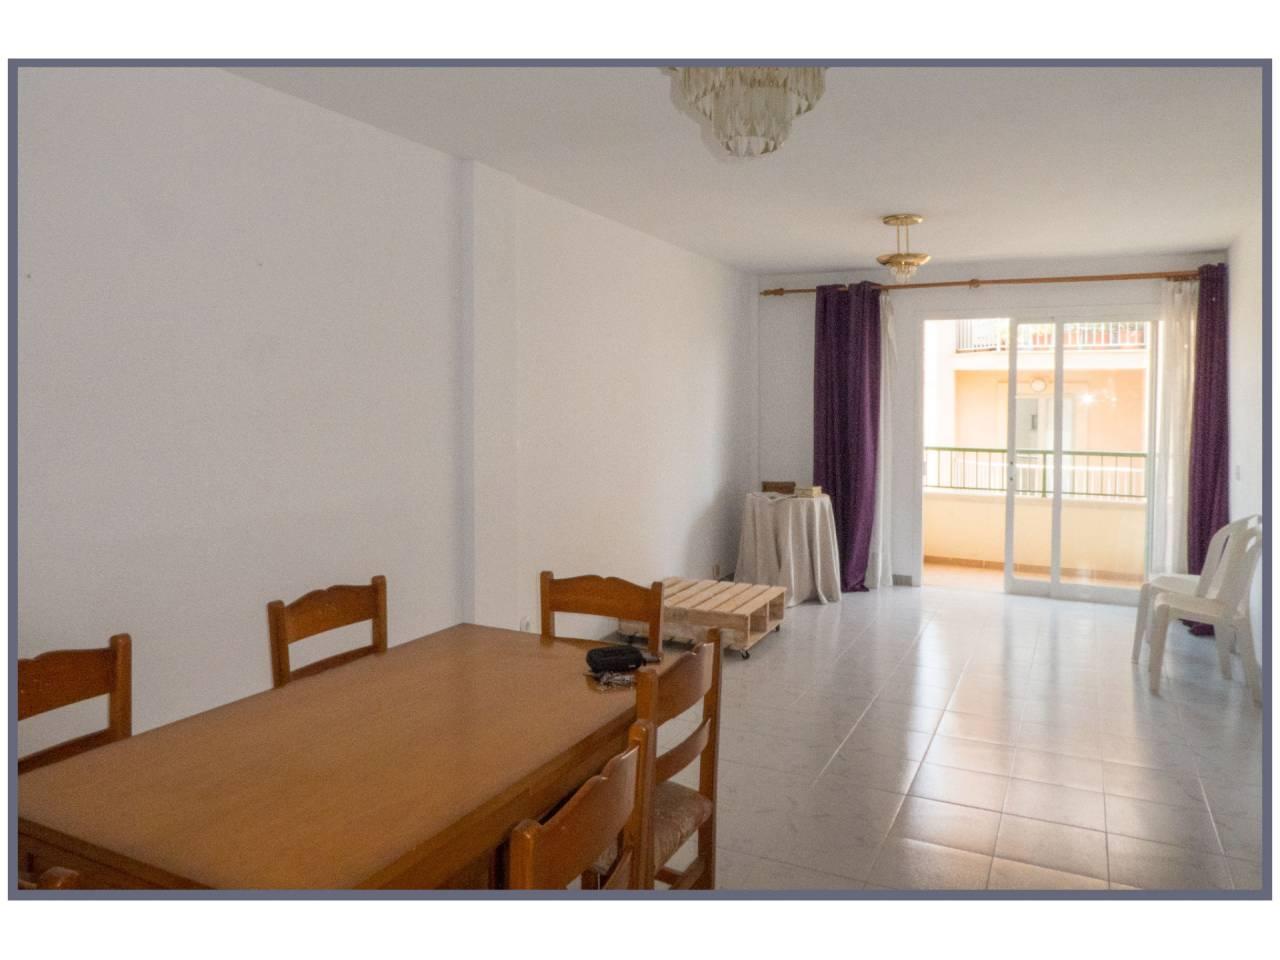 Appartamento  Calle fra gaietà de mallorca, s/n. Se vende acogedor piso situado en el pintoresco pueblo de lloset